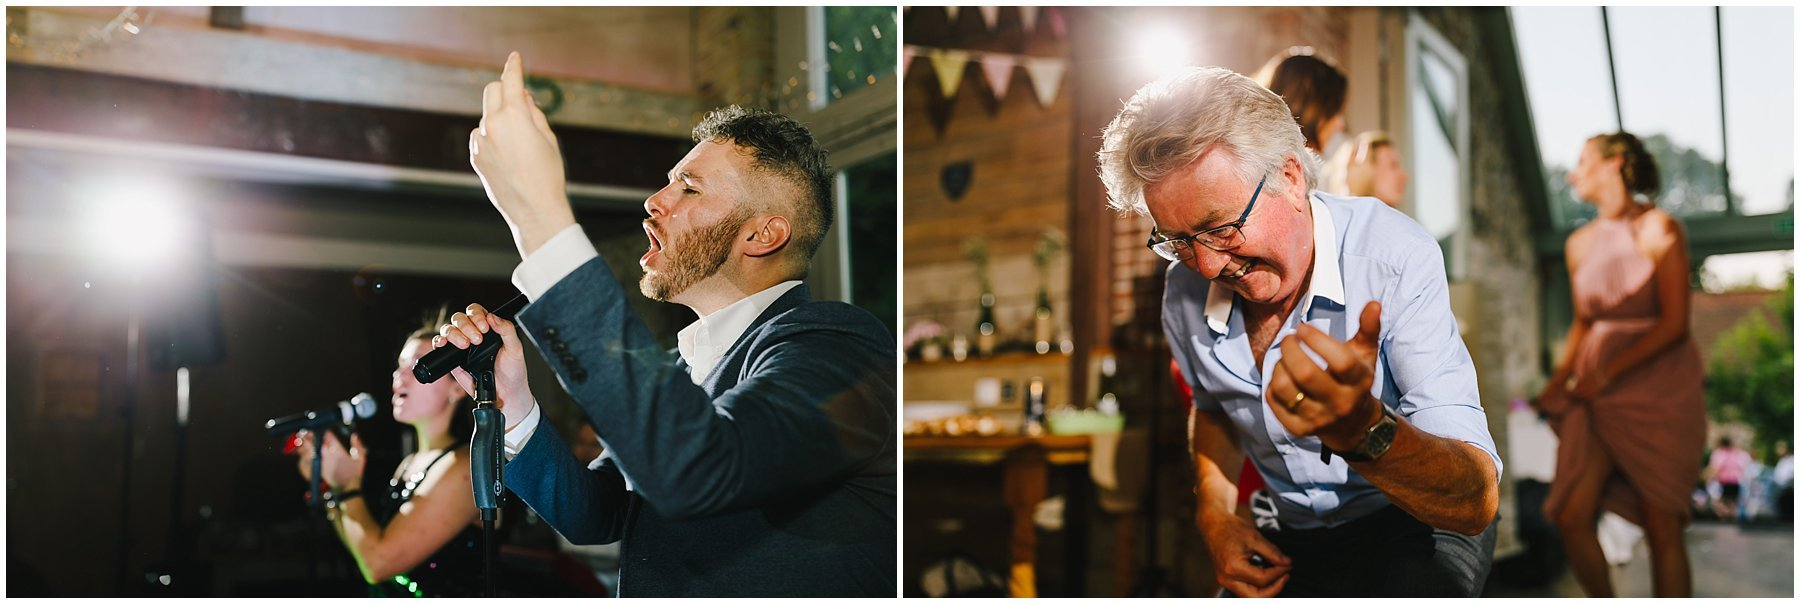 GEORGE AND KATH WEST LEXHAM MANOR WEDDING - NORFOLK WEDDING PHOTOGRAPHER 1